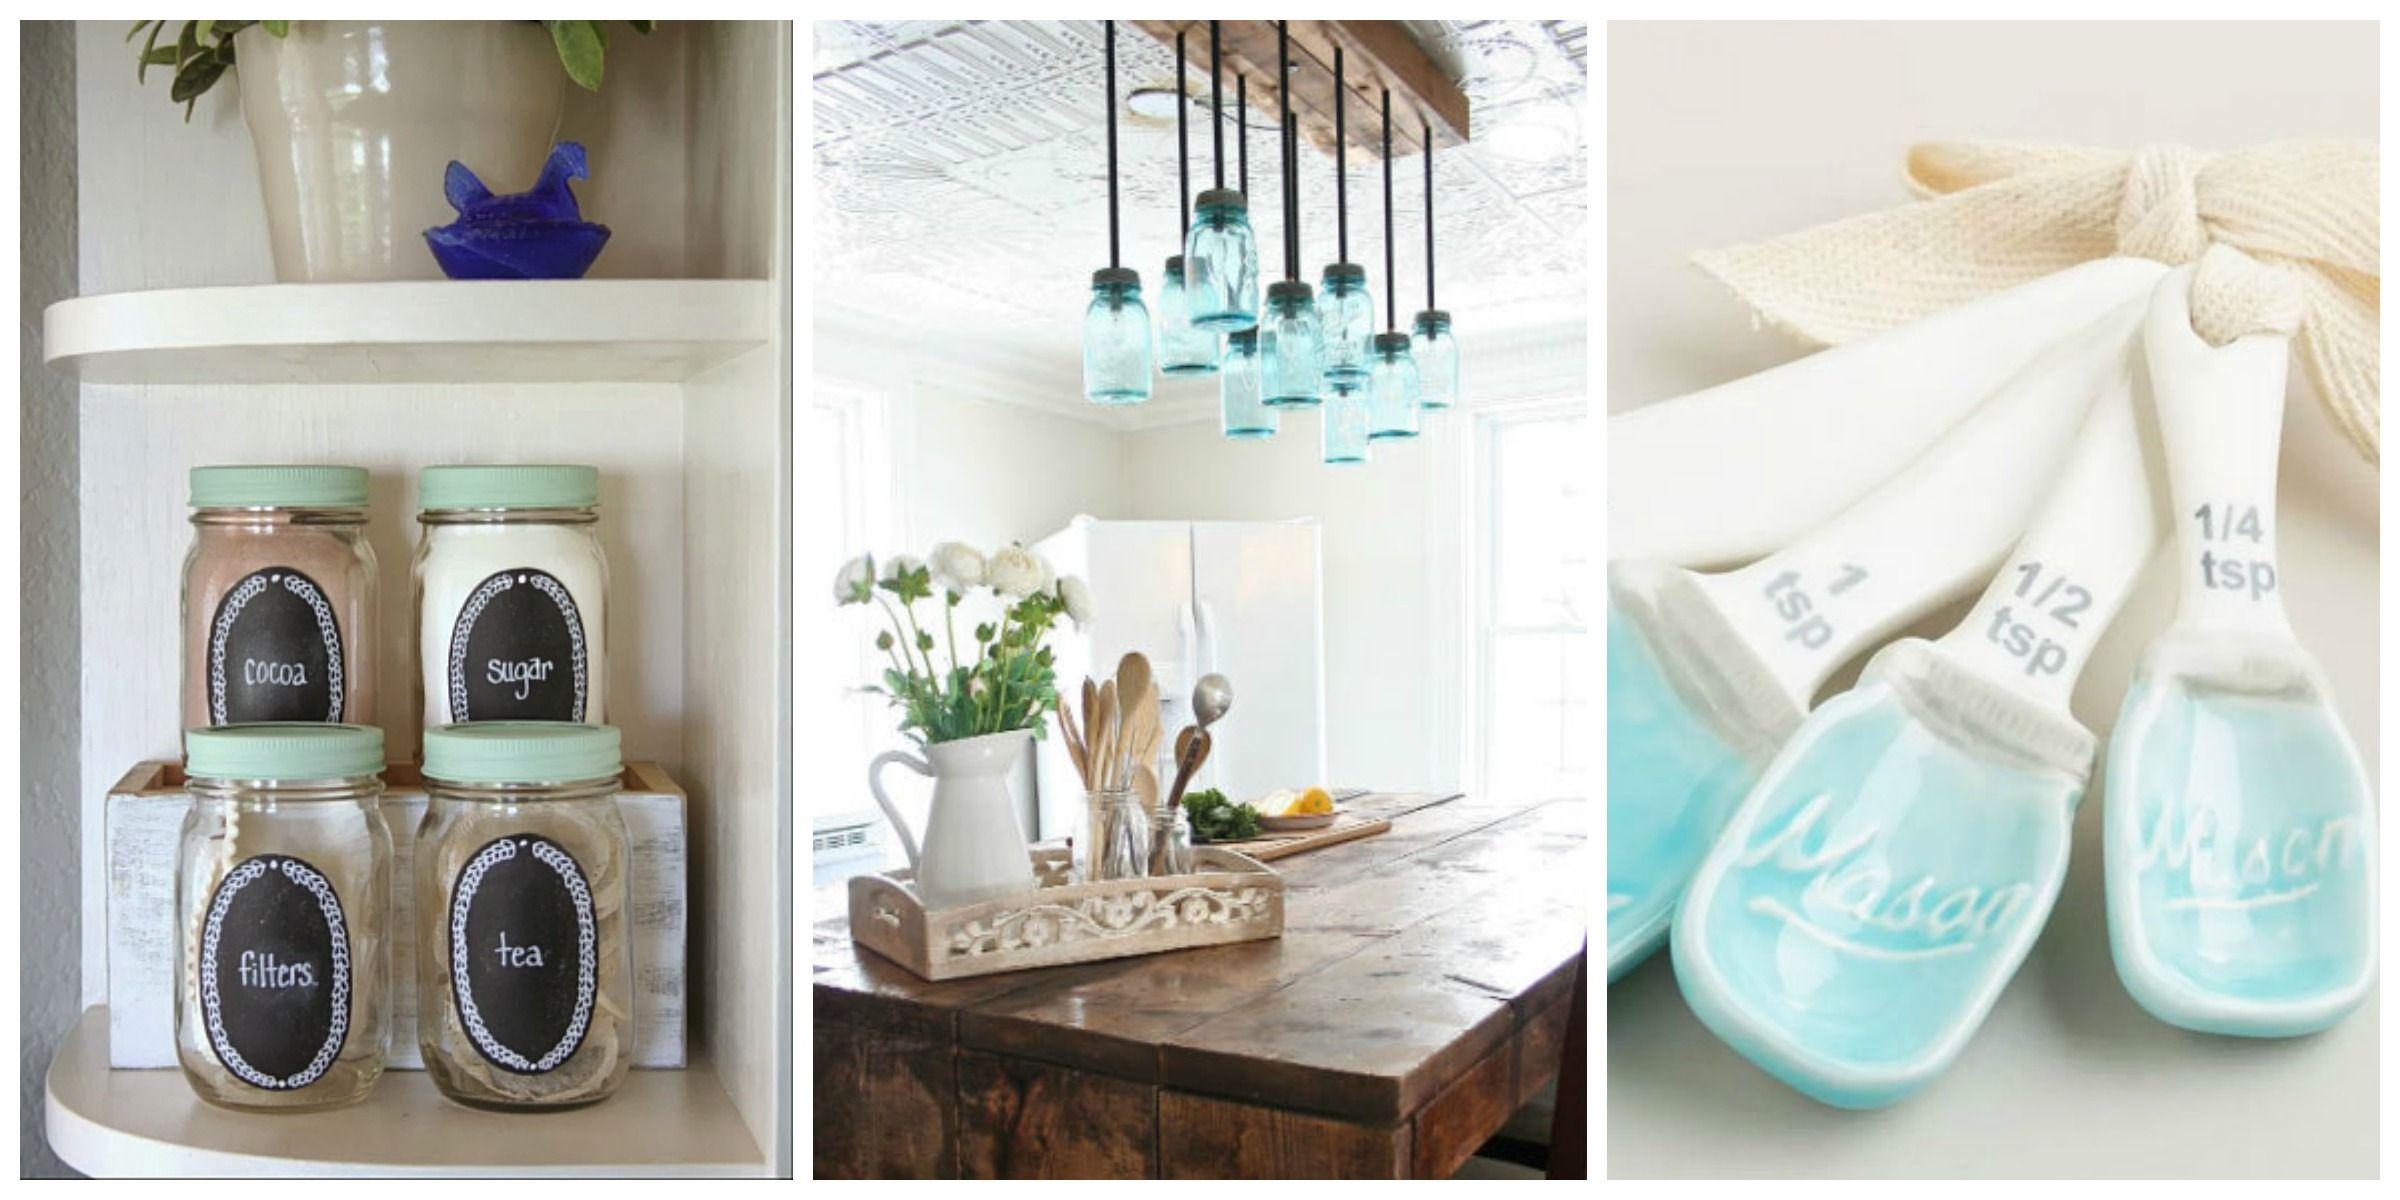 Mason Jar Kitchen Decorating Ideas - Mason Jar Ideas